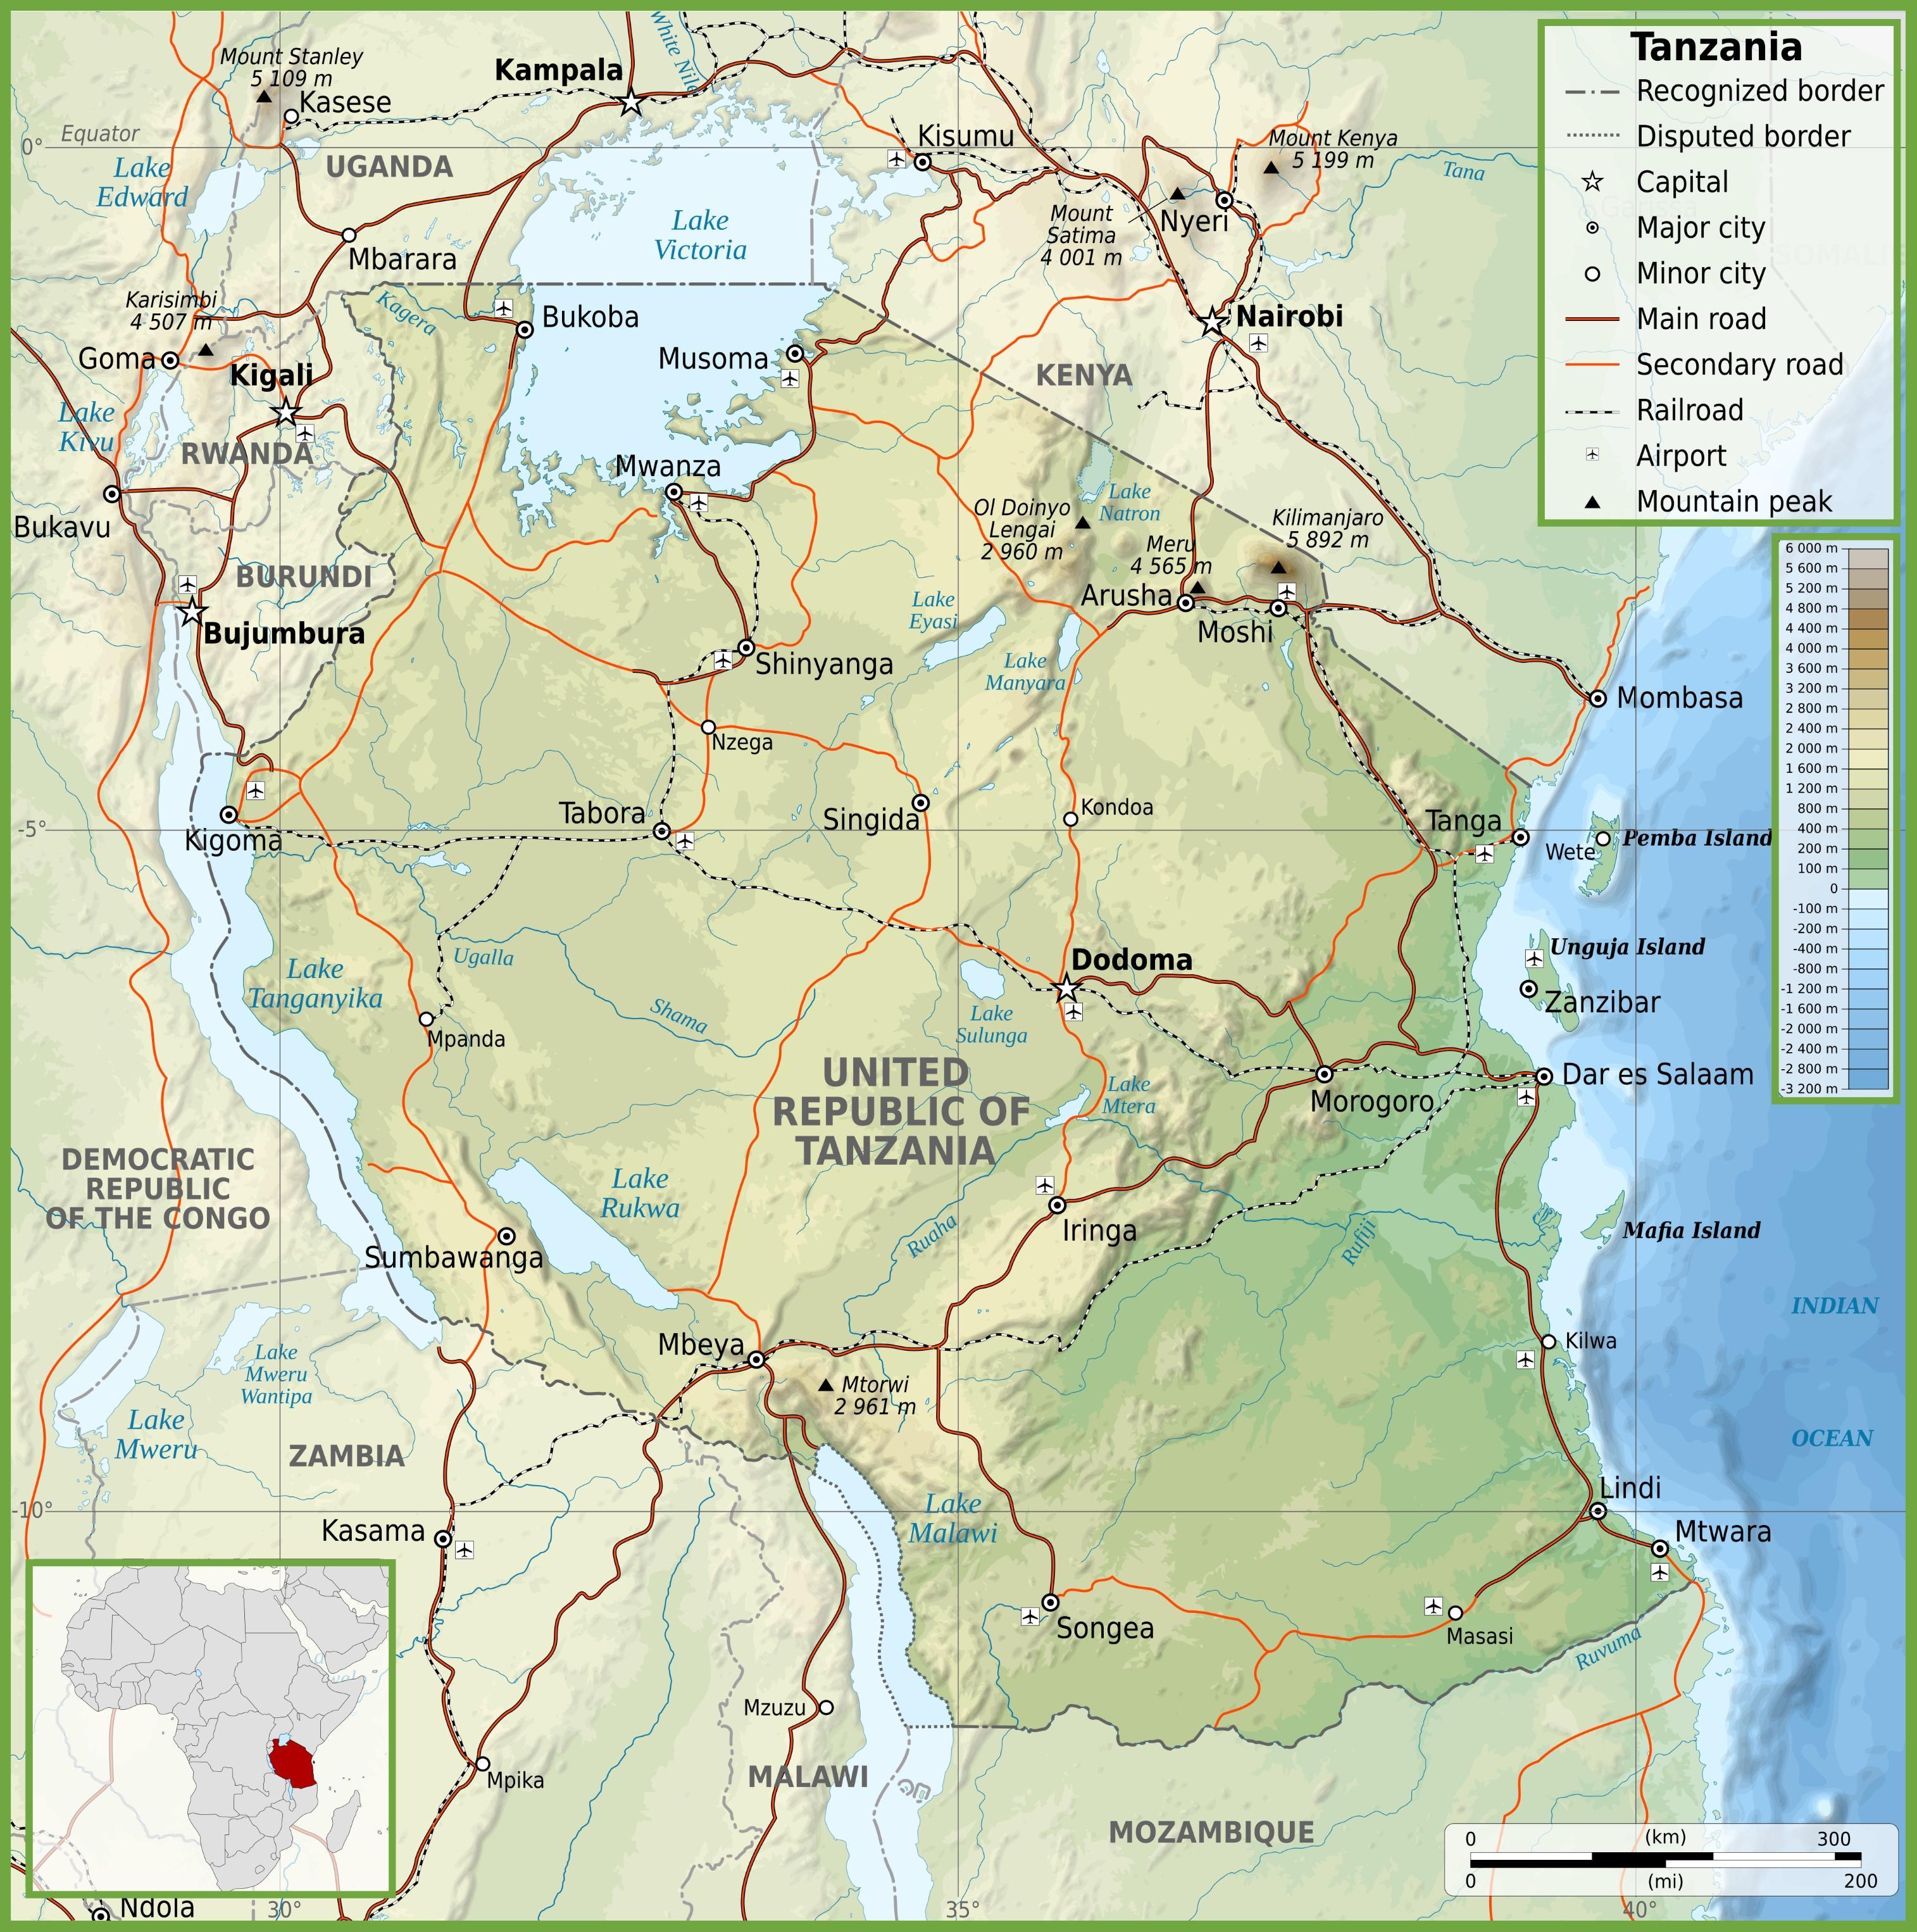 east africa road map Tanzania Roads Map Tanzania Road Map With Kilometers Eastern east africa road map